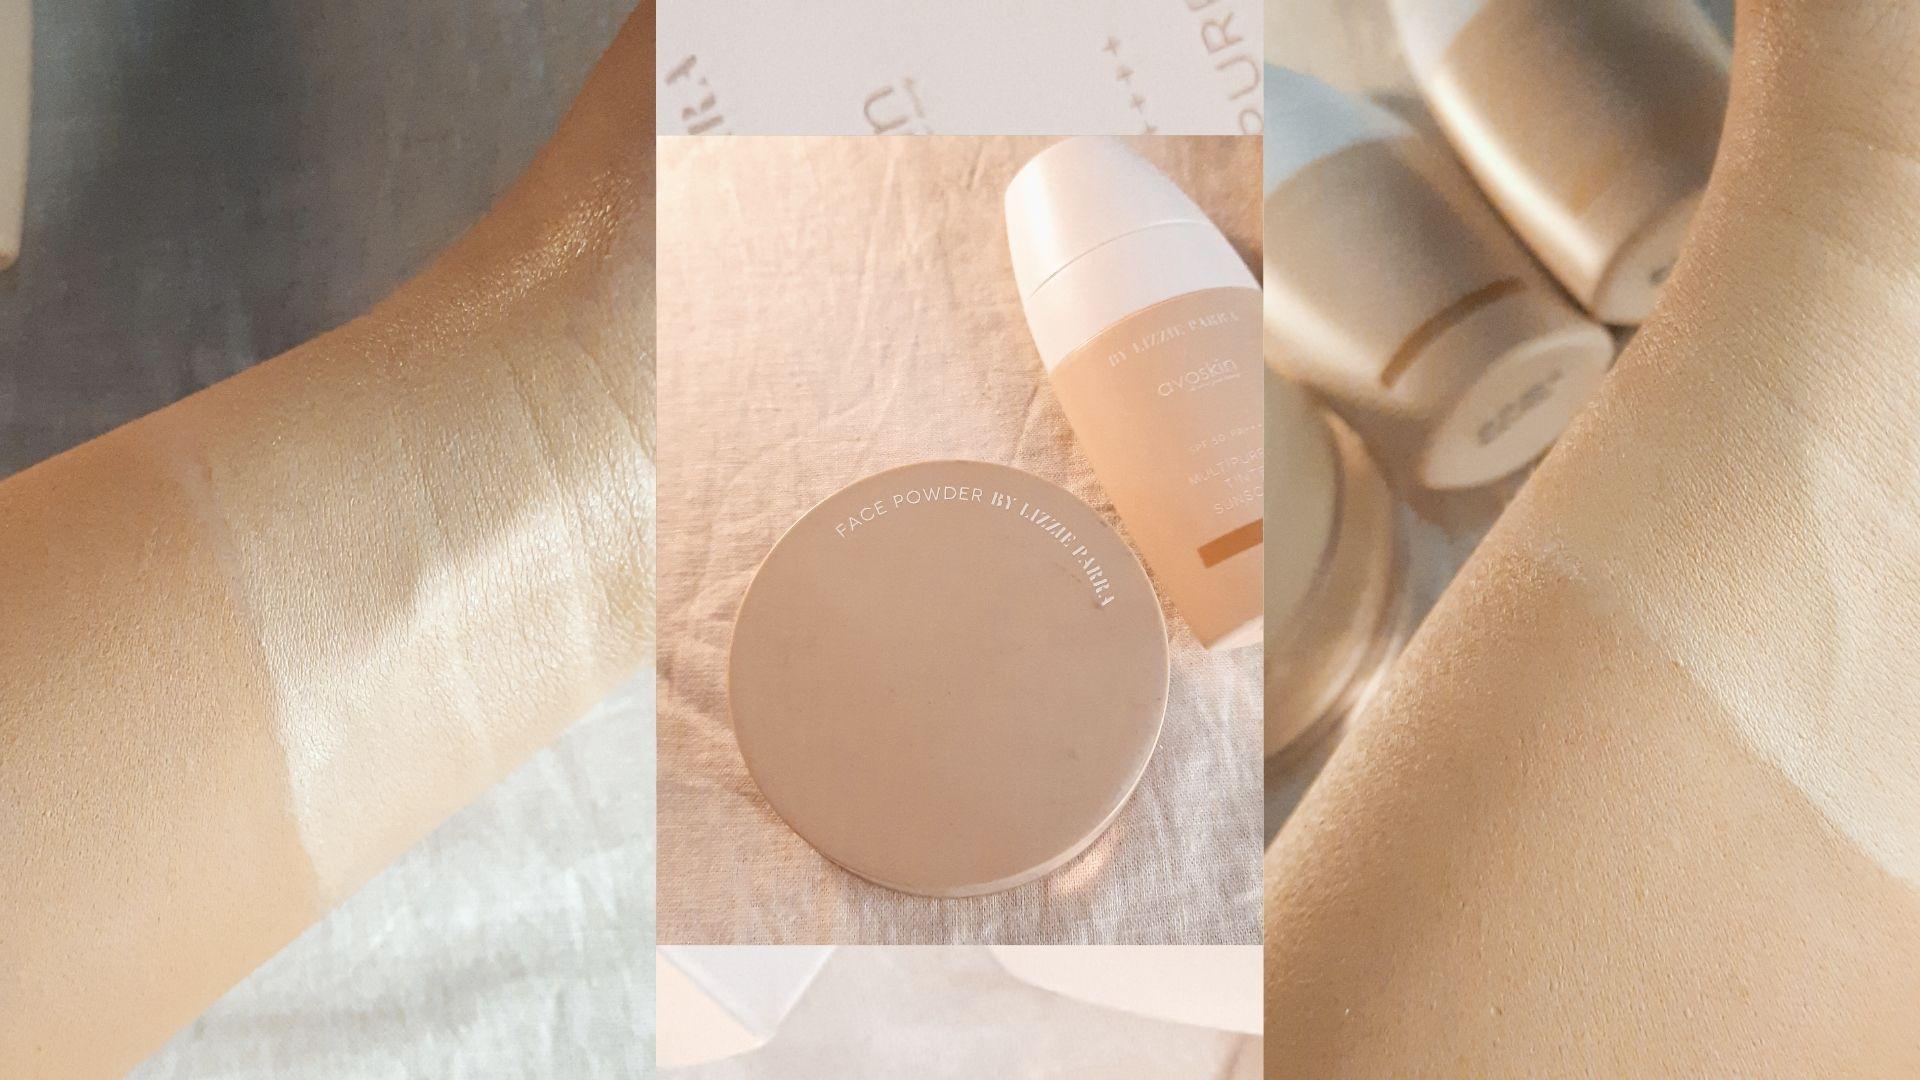 Multipurpose Tinted Sunscreen, powdered